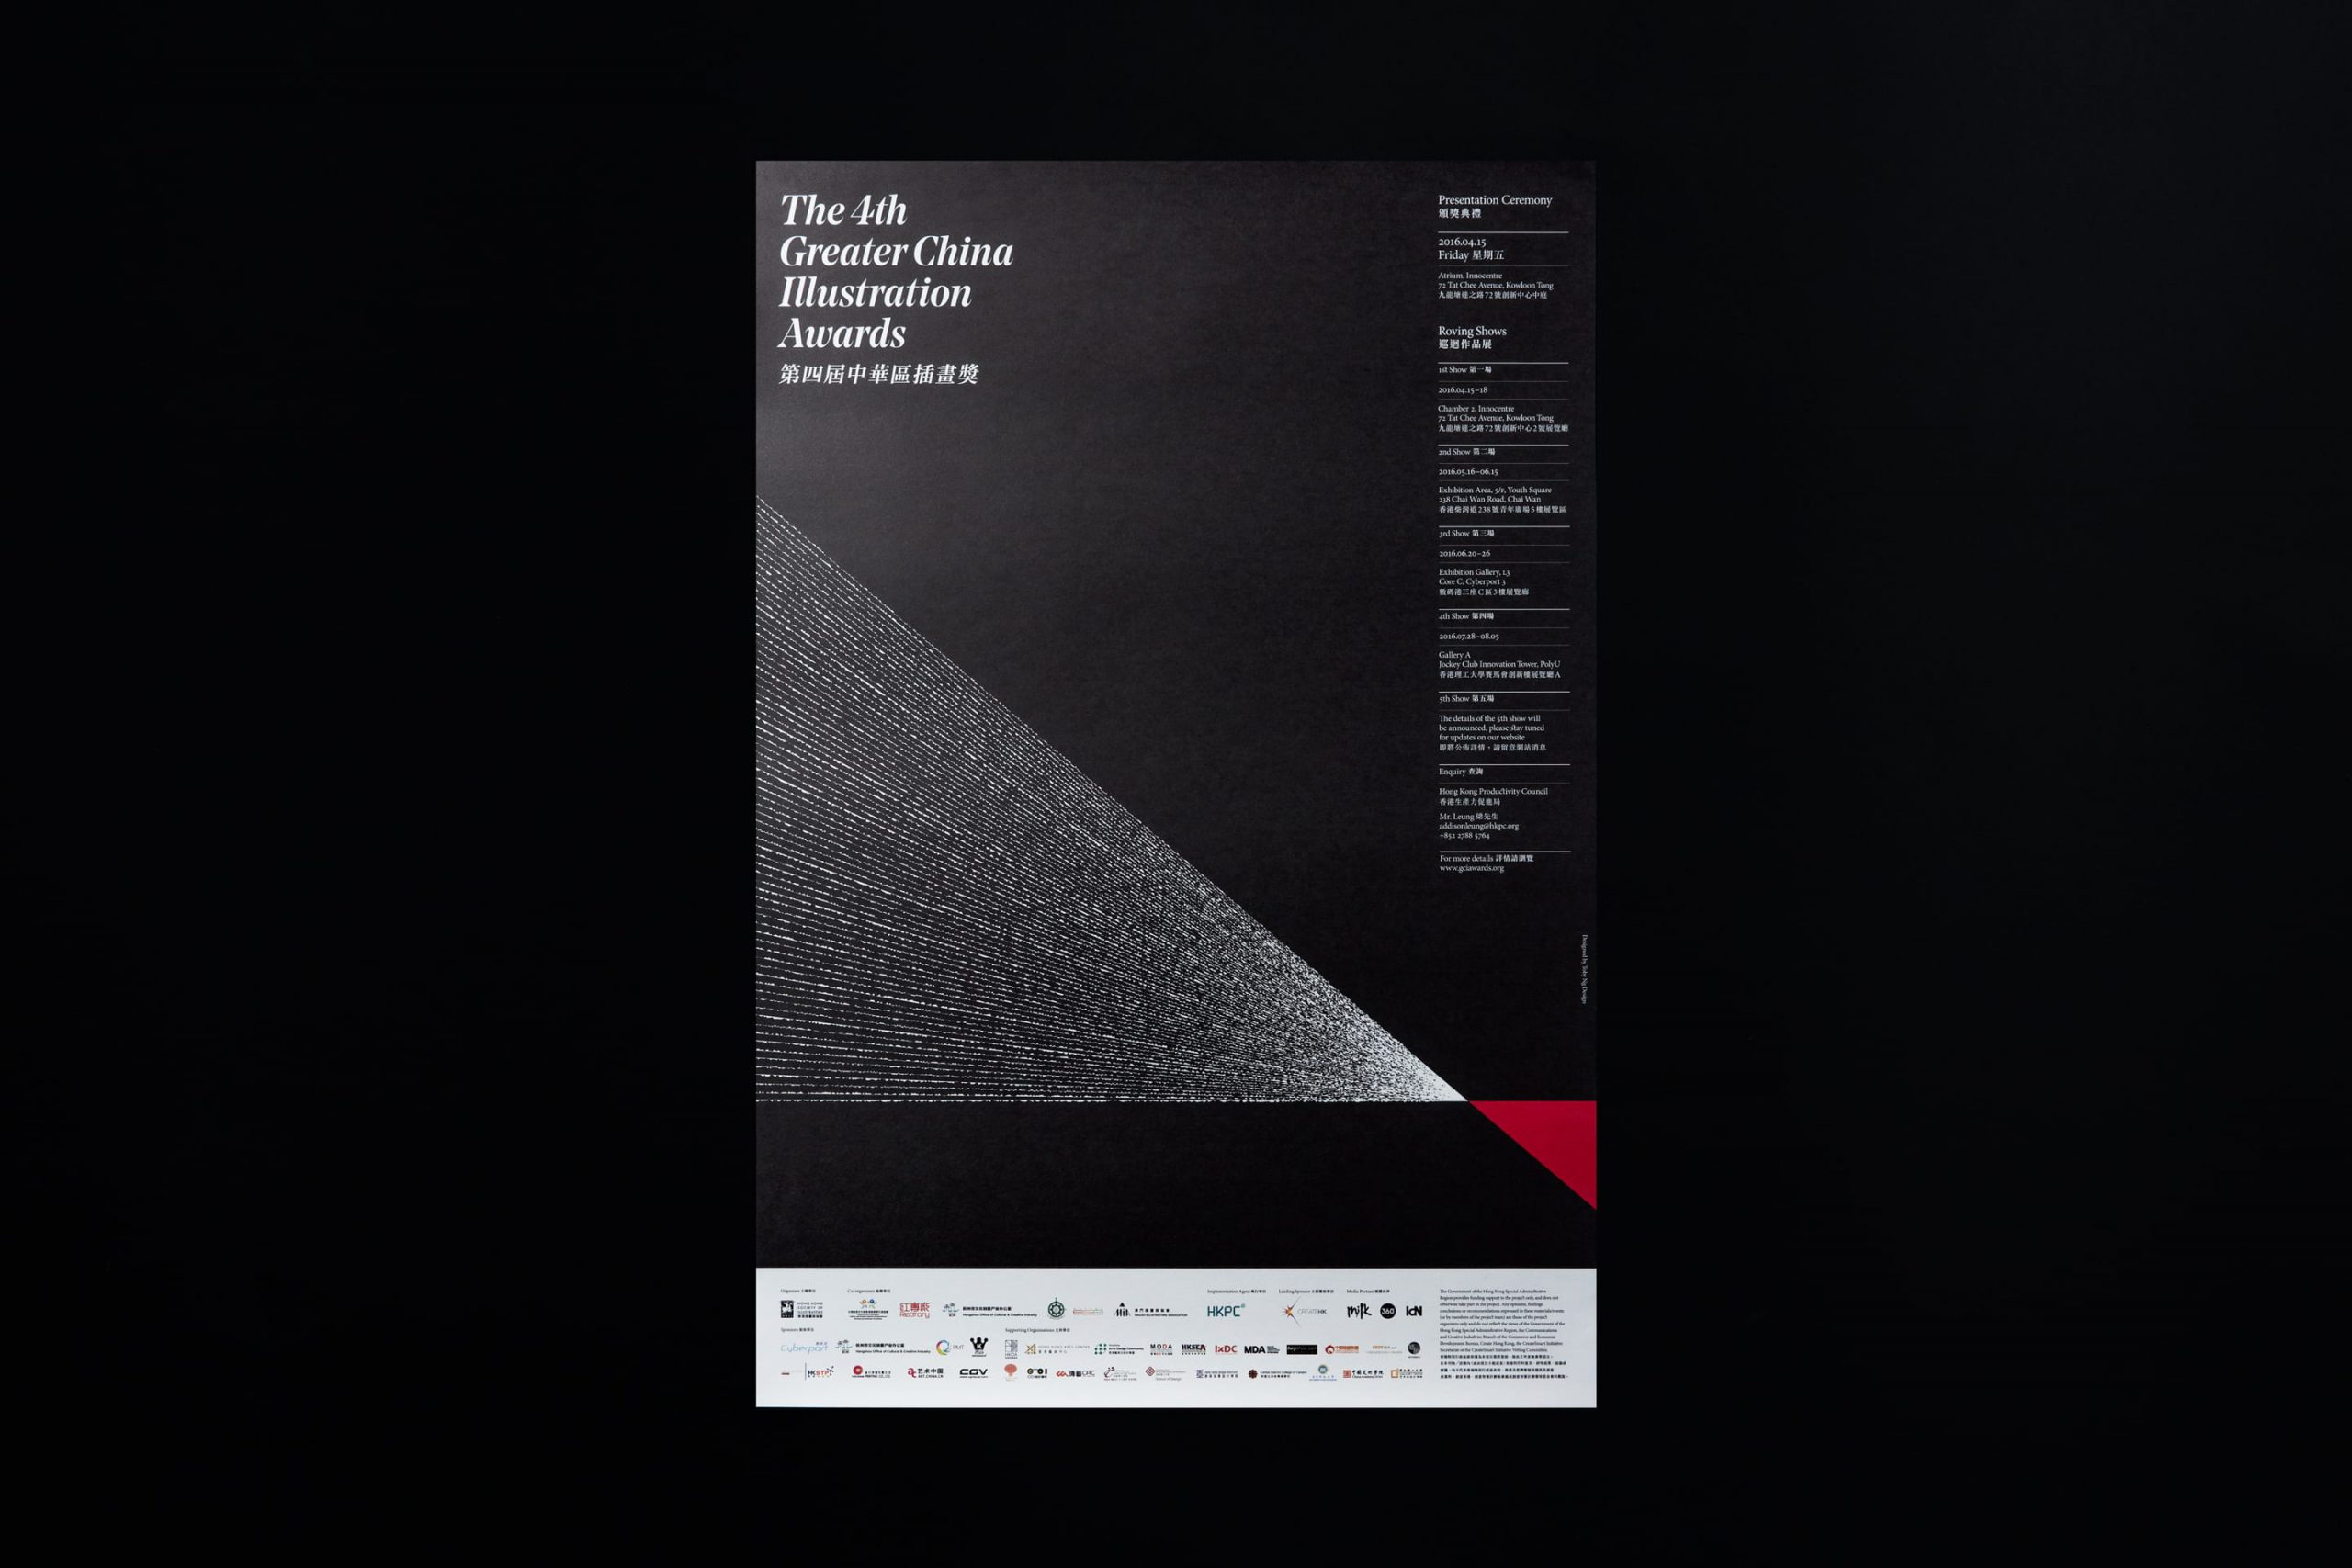 4th-greater-china-illustration-awards_17